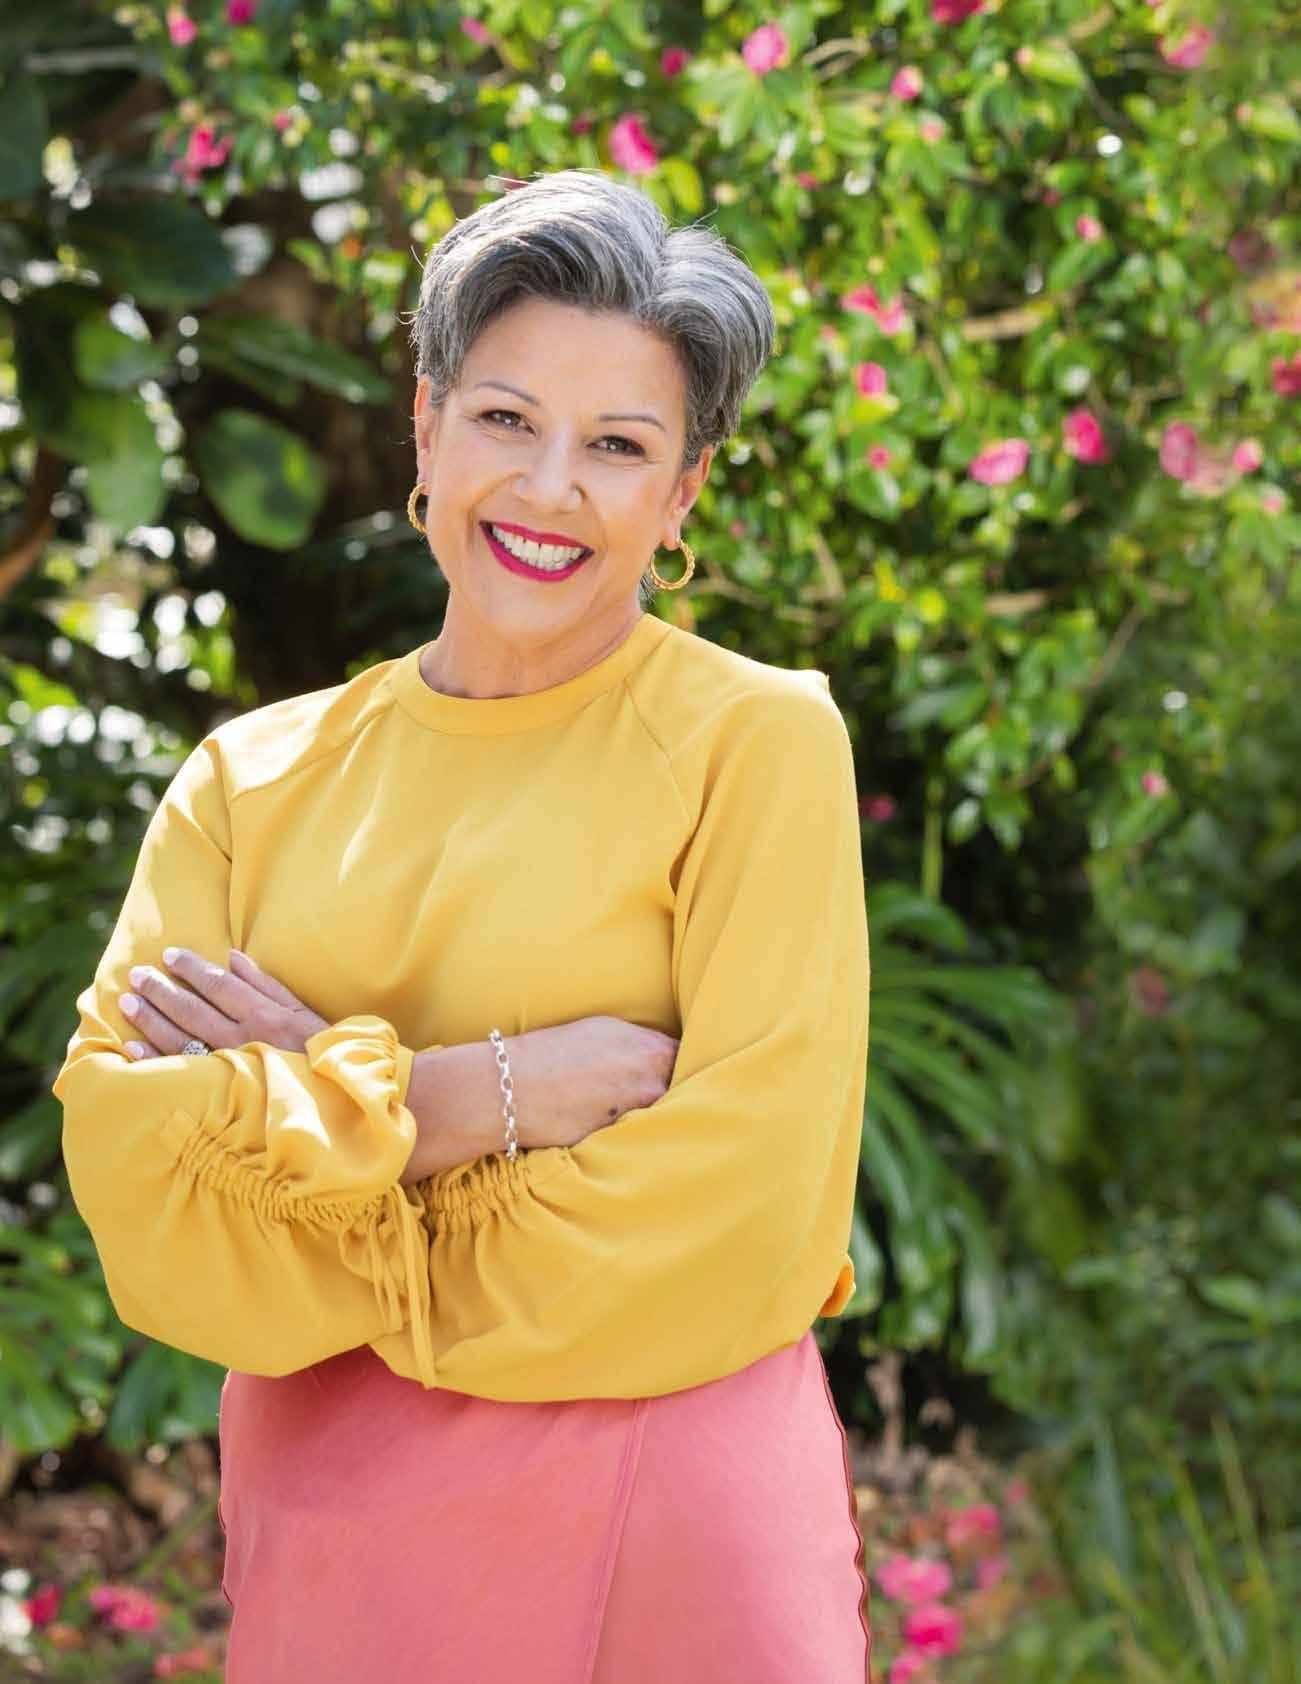 Paula's Life After Politics - 'I'm Scared But I'm Ready'